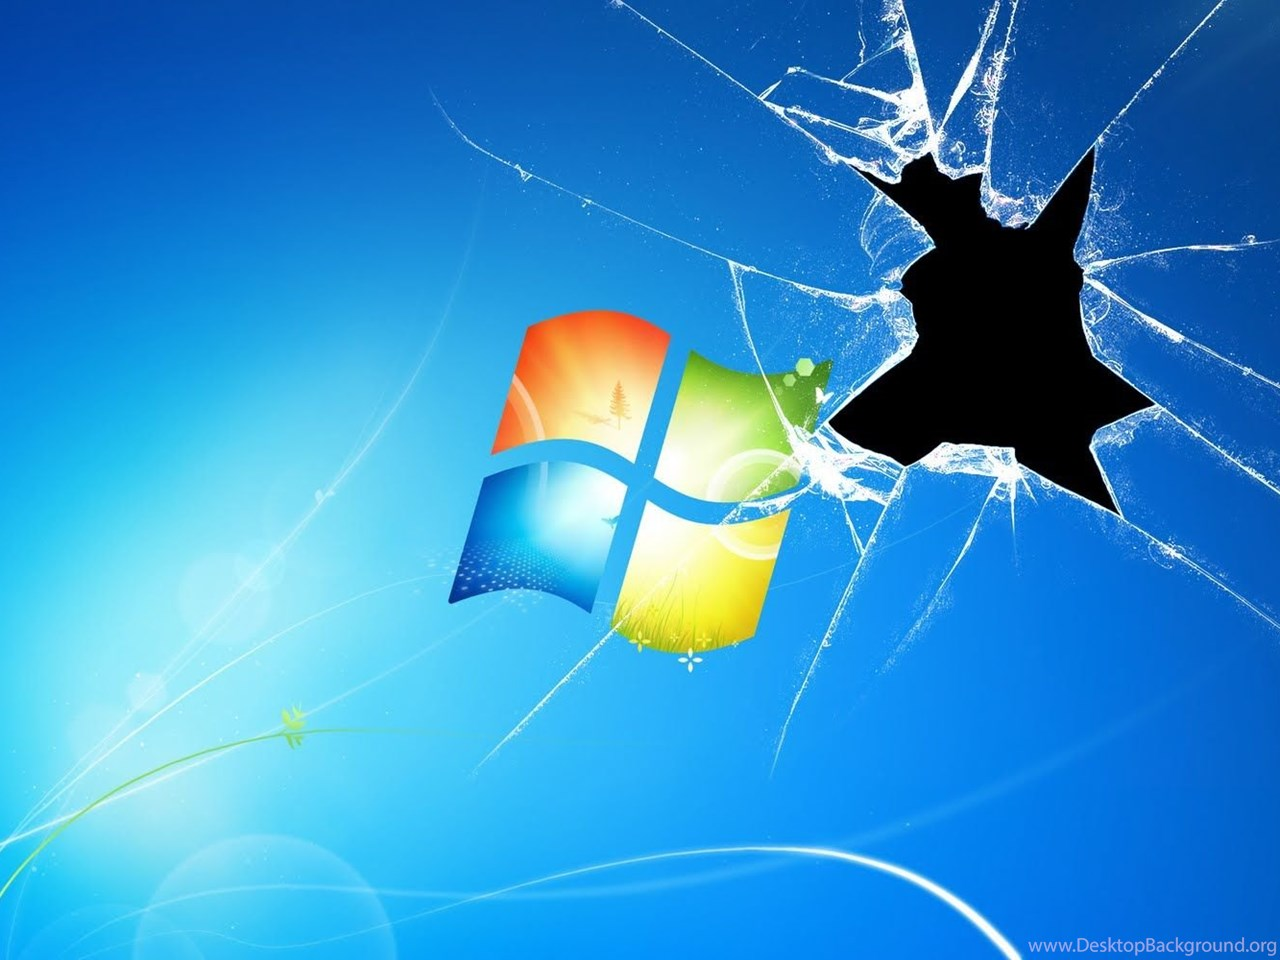 Wallpaper Wallpapers Hd Desktop Windows 7 Desktop Background